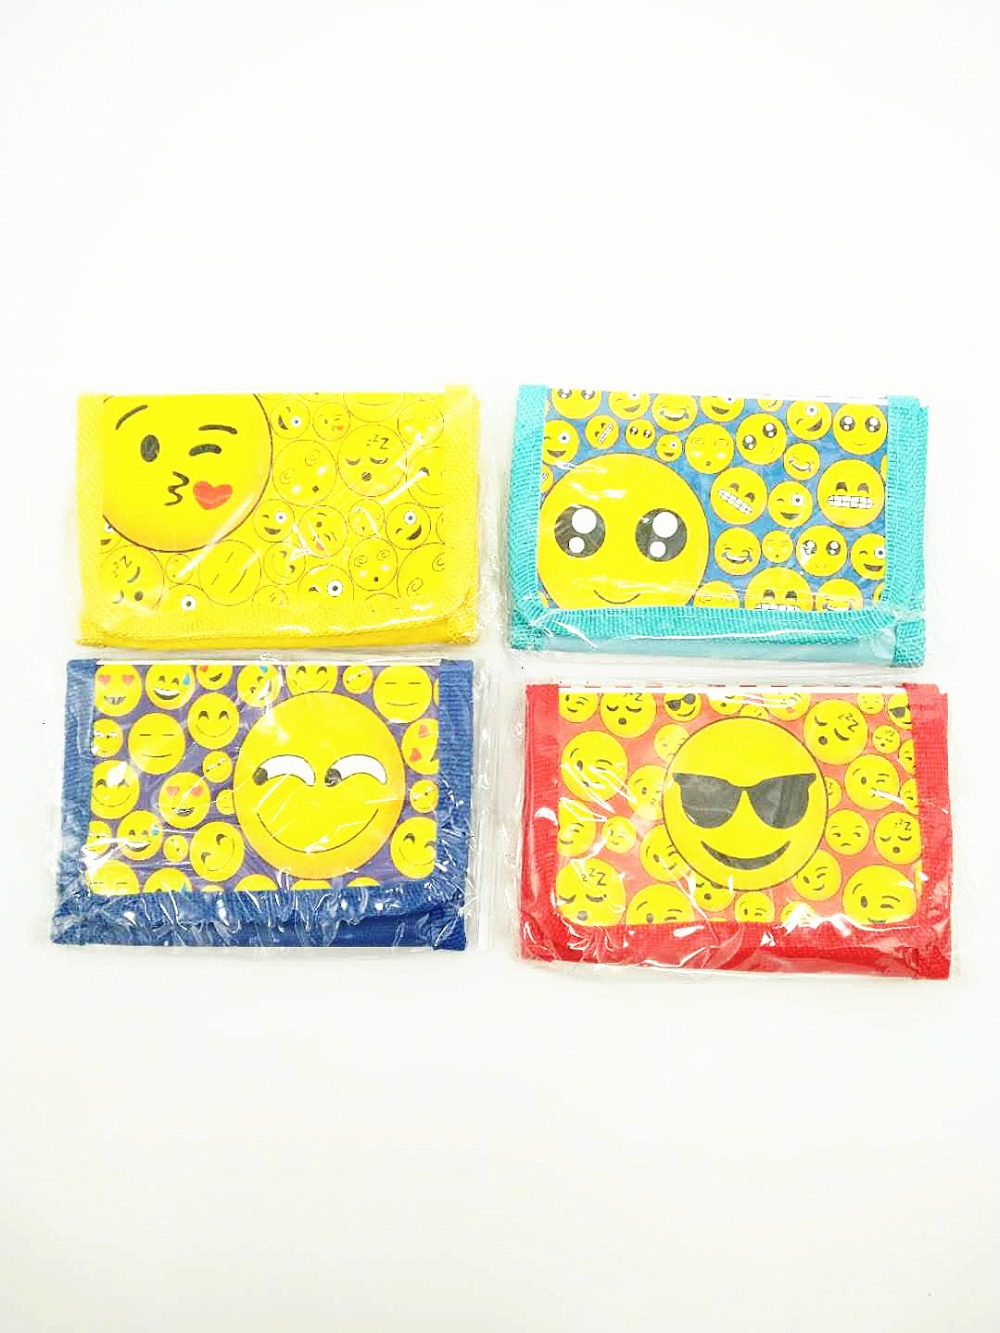 1Pcs Emoji Cartoon Mini Wallets Children Birthday Party Gift Favors Supplies Coin Purse Money Bags